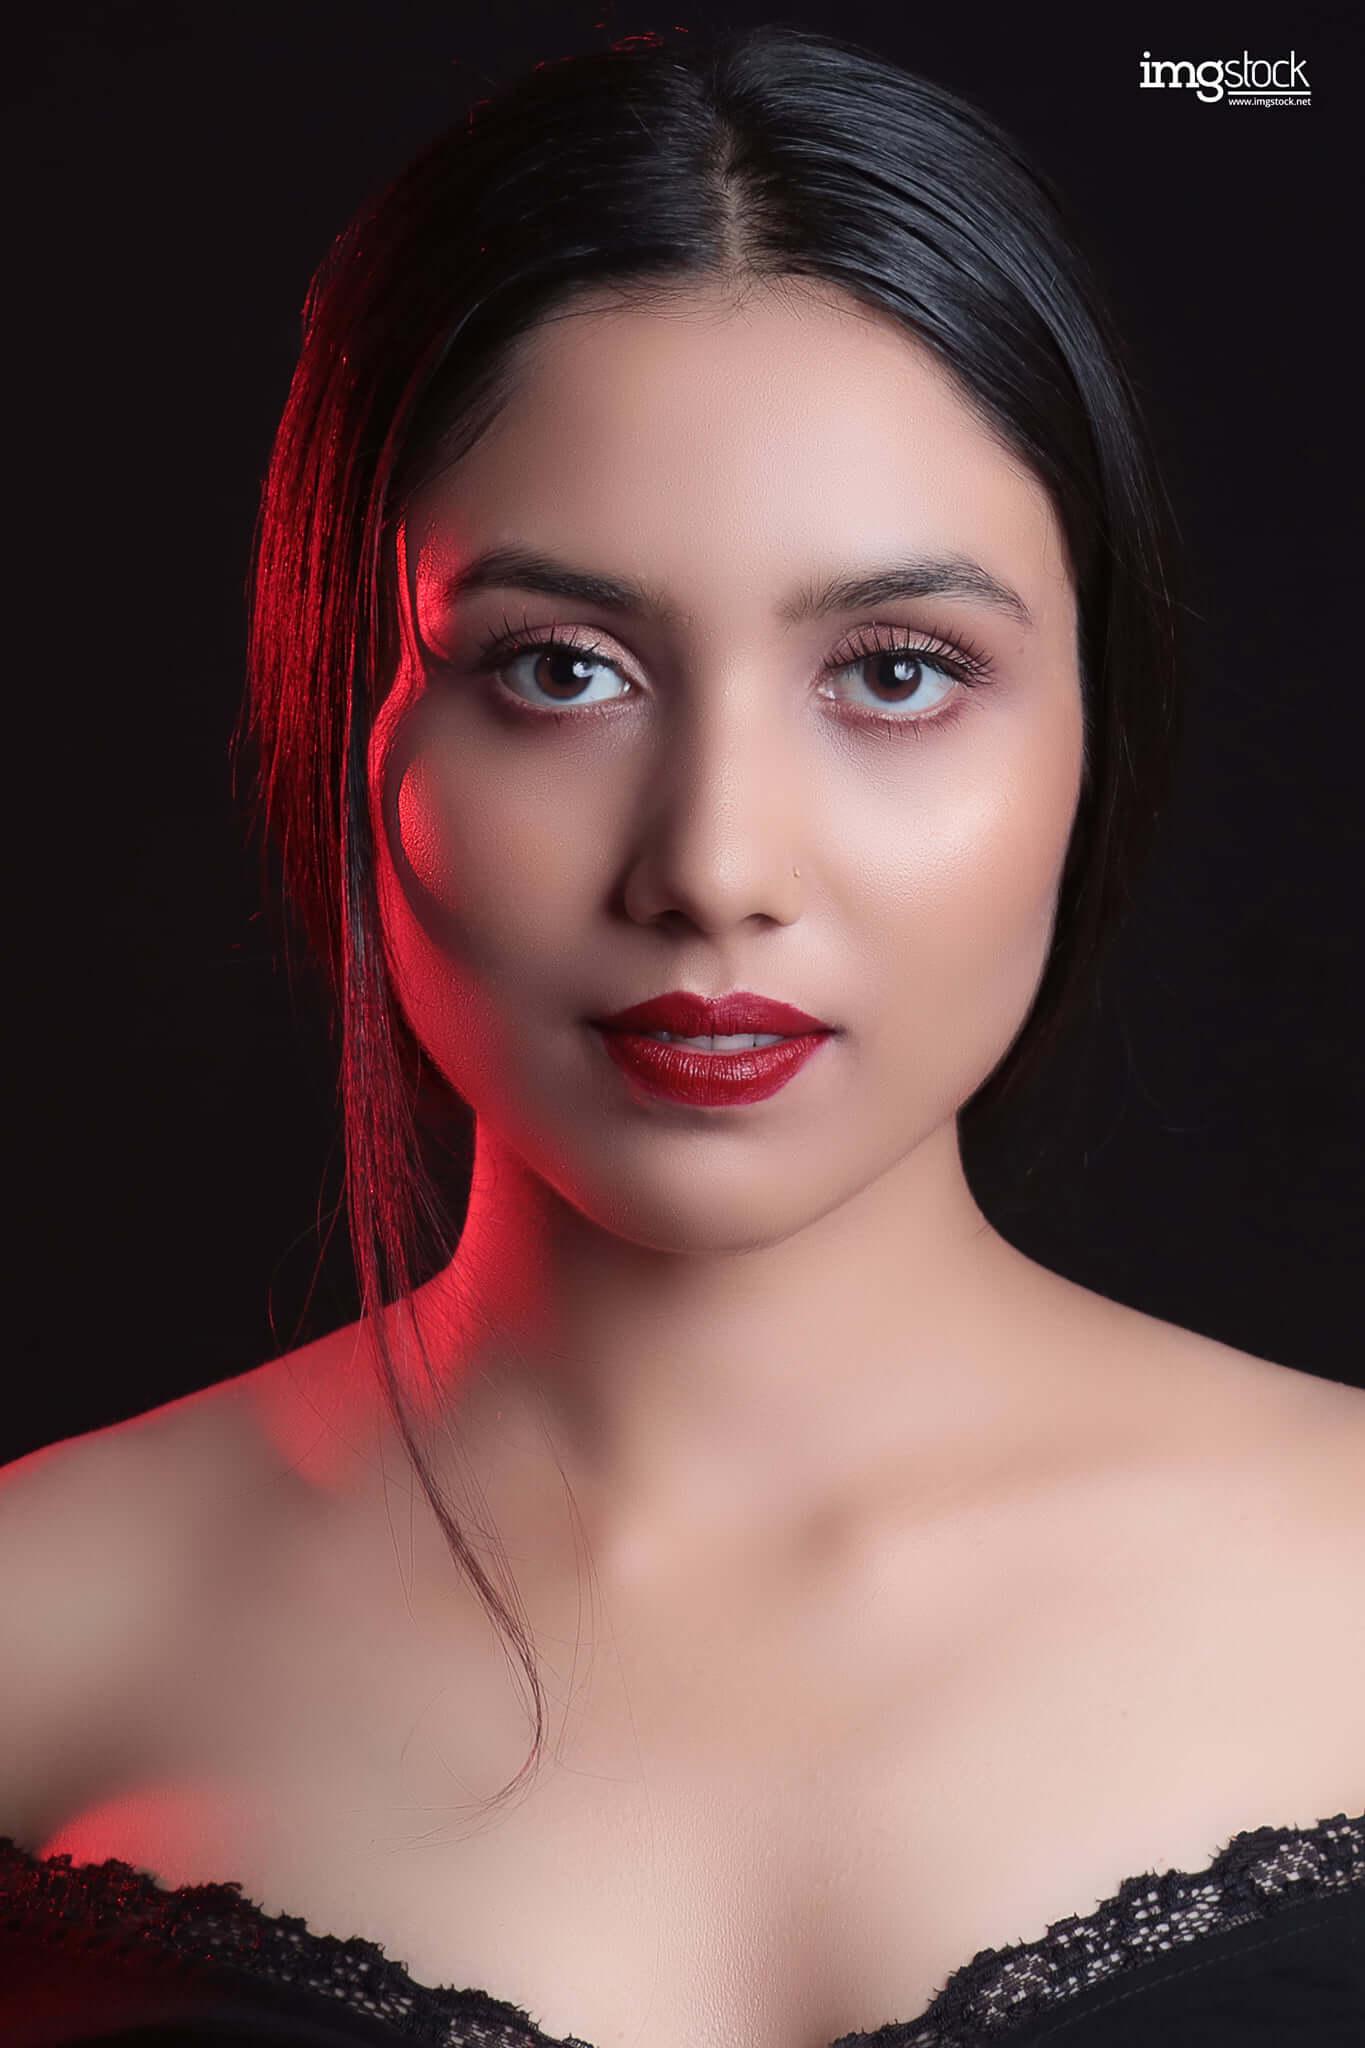 Preeyanka Khatiwada - Modeling Photography Service, ImgStock